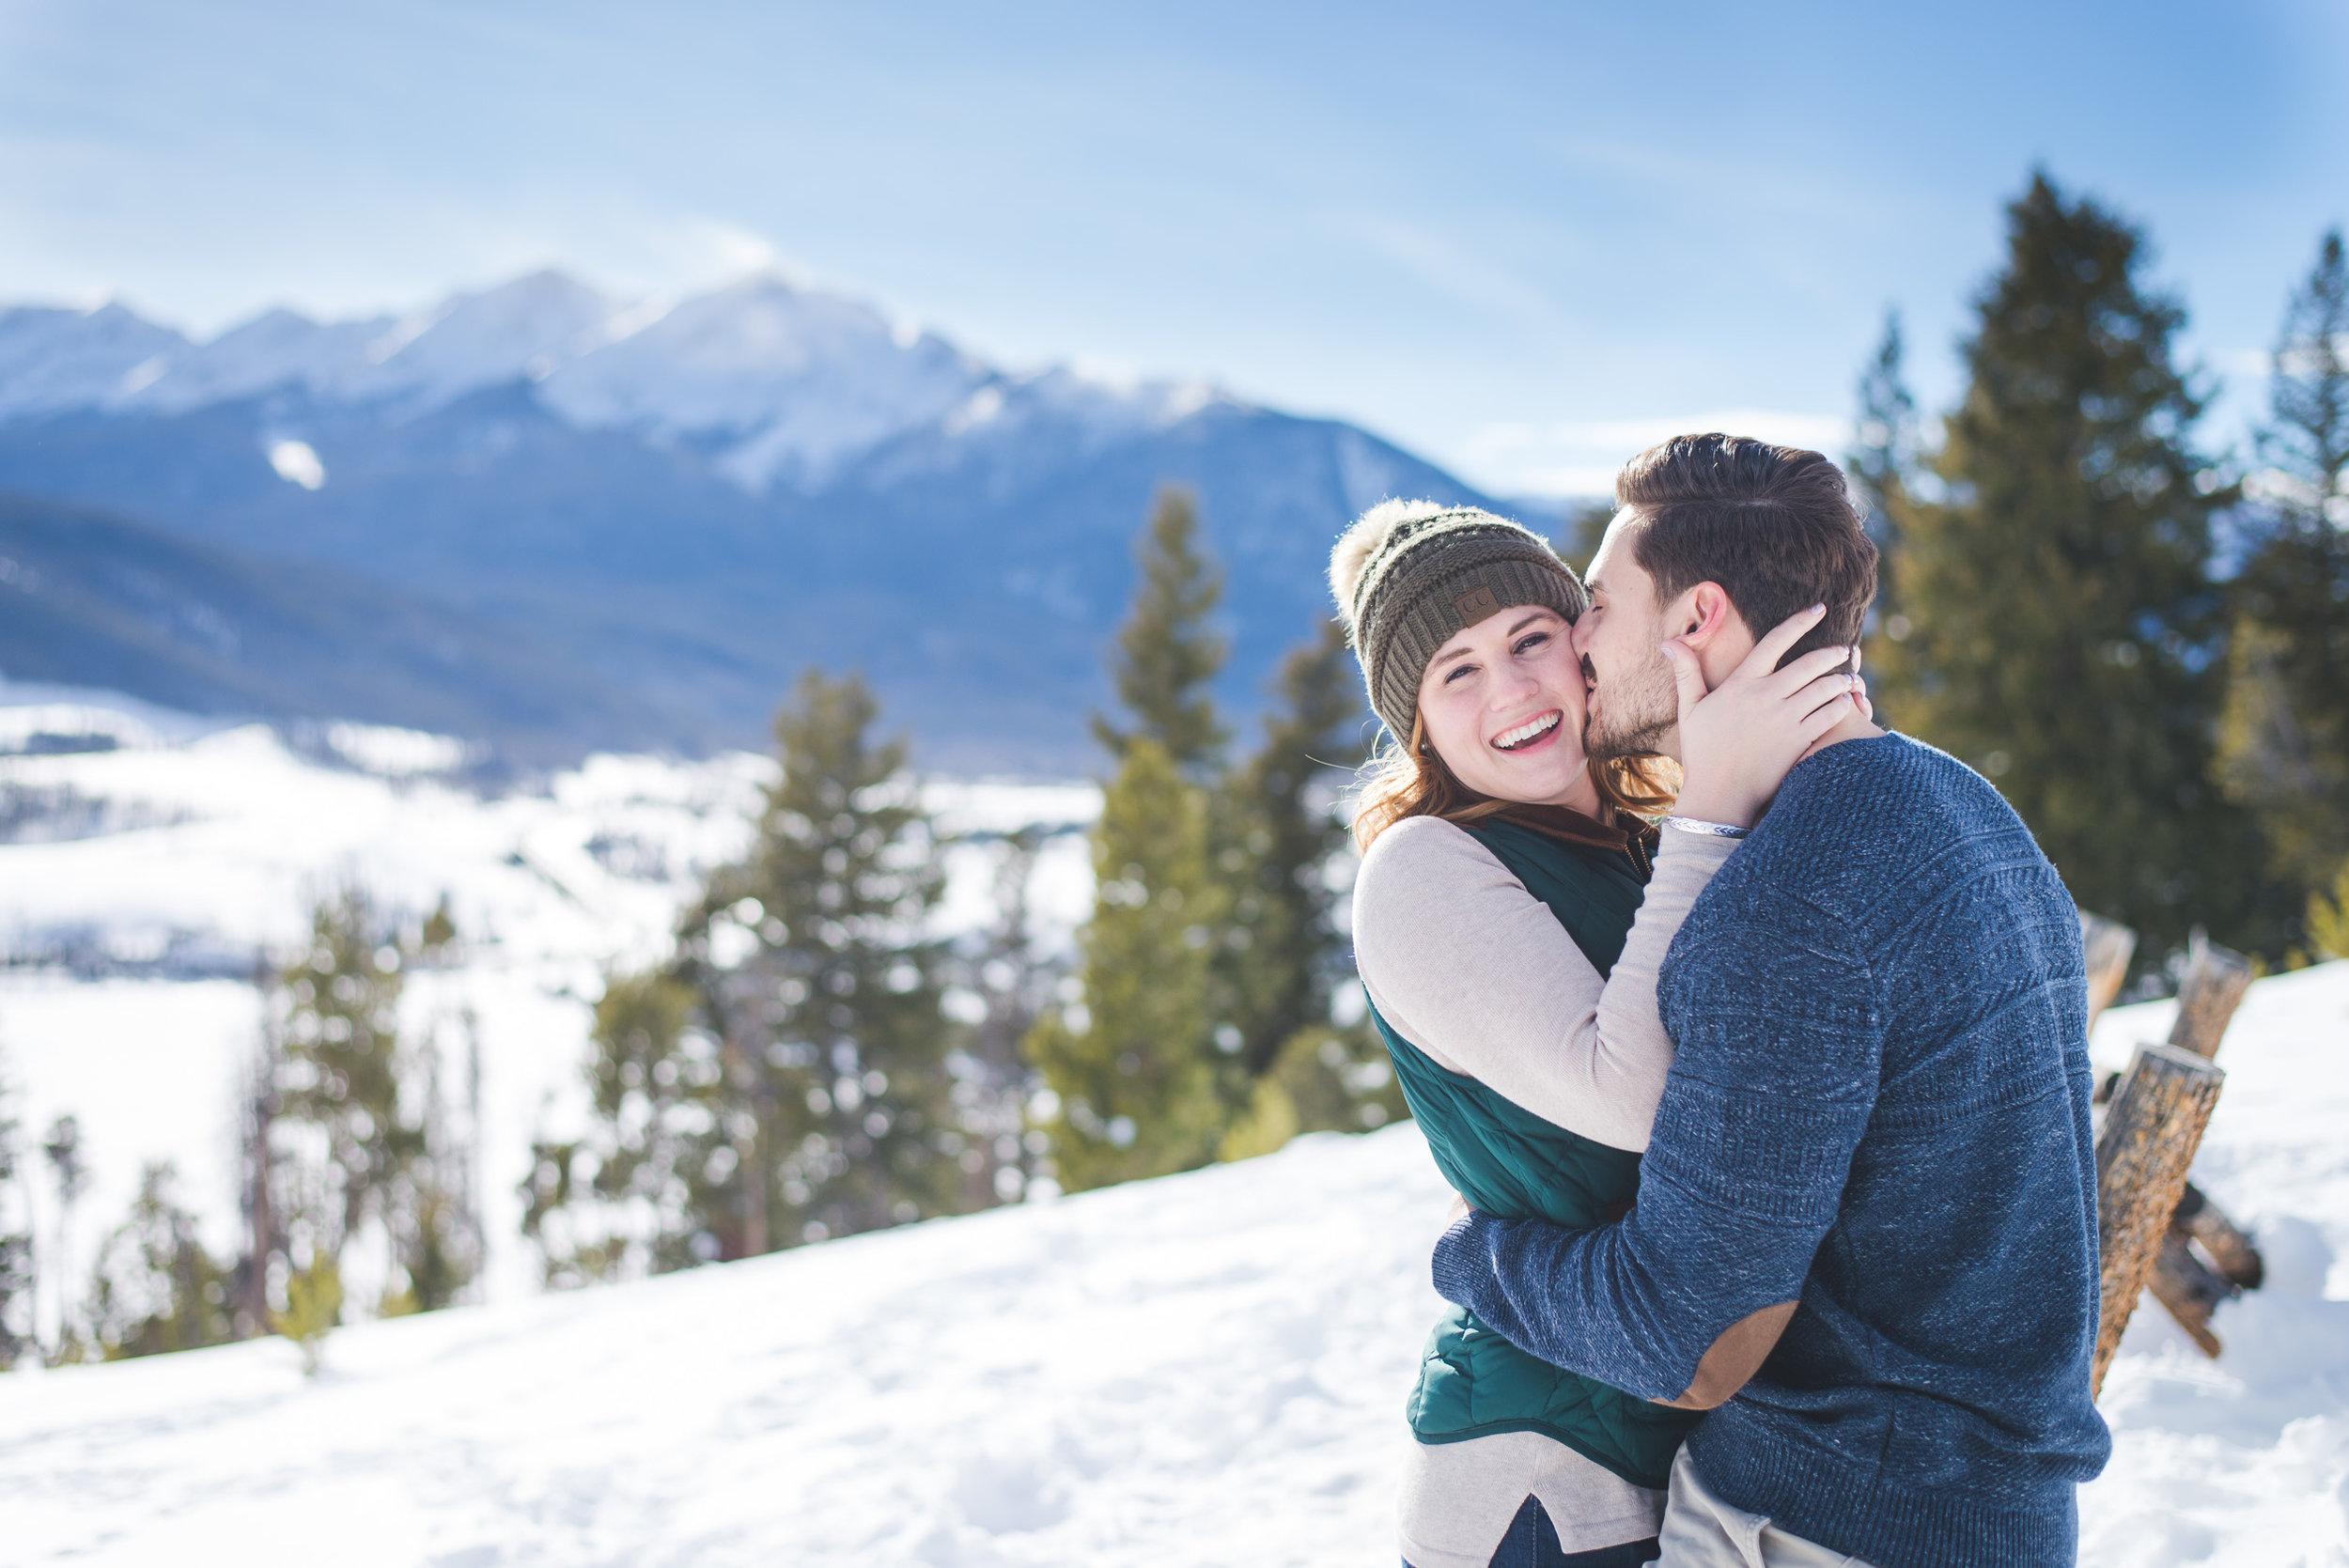 Colorado winter destination engagement photo session near Keystone and Dillon, Colorado   Keeping Composure Photography